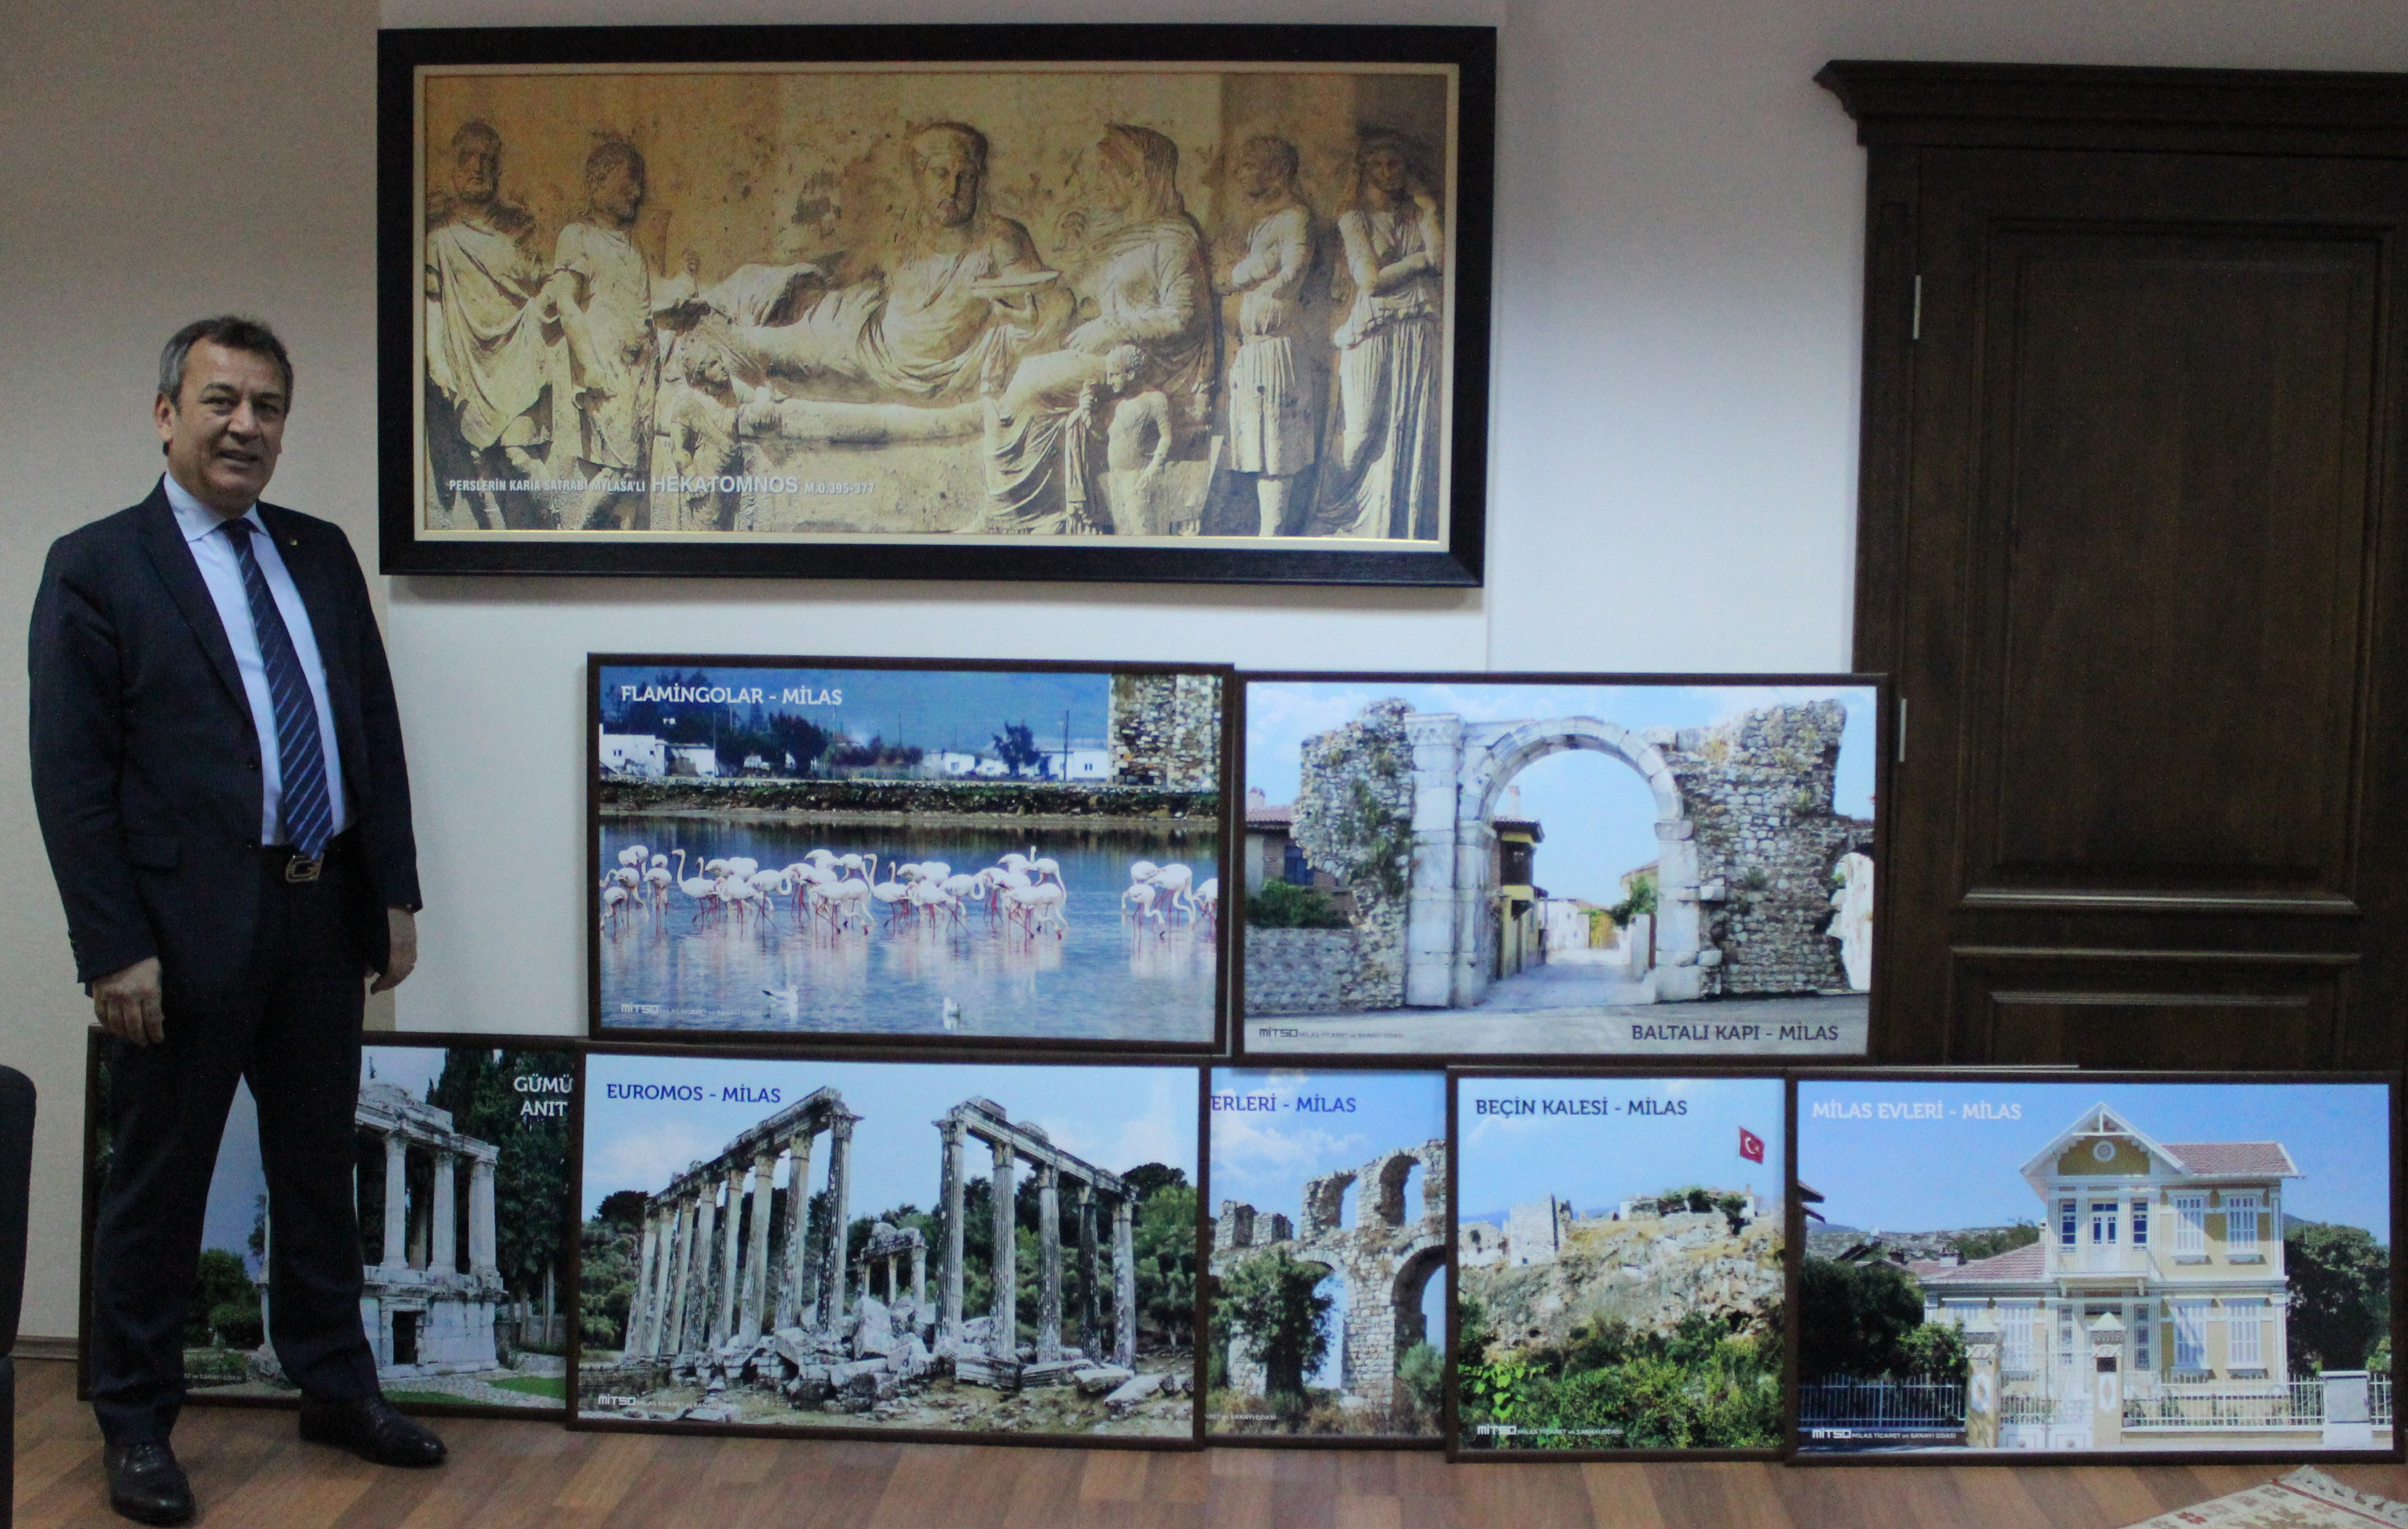 MİTSO'DAN HAVALİMANINA MİLAS'IN TANITIMI FOTOĞRAFLARI